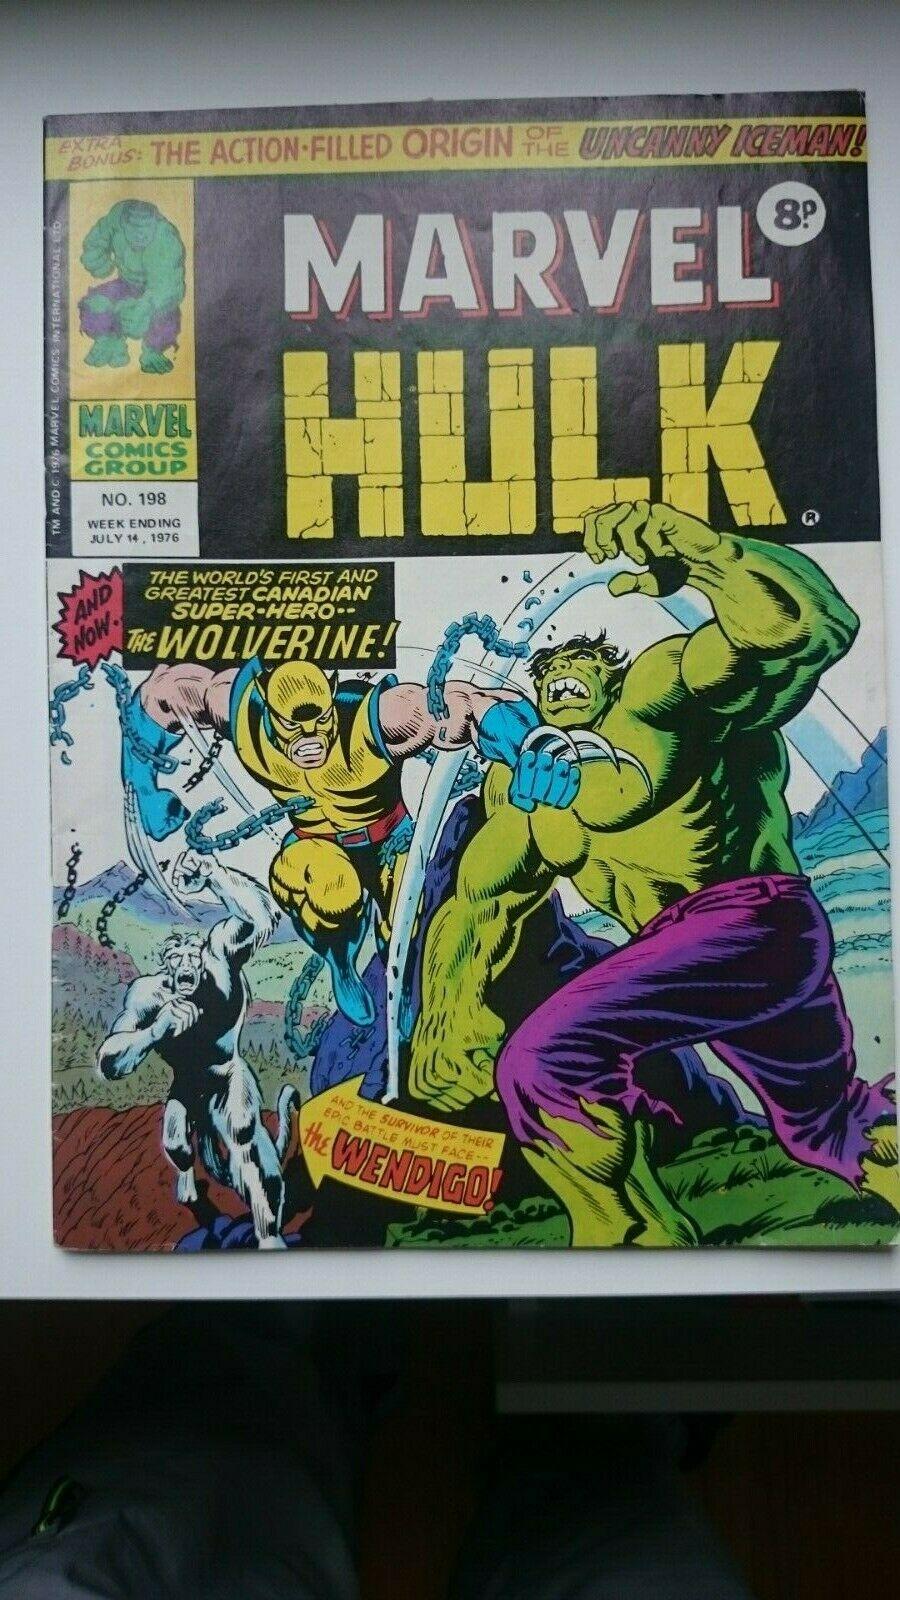 HULK 181 RARE UK MIGHTY WORLD MARVEL #198 VF+ 8.5 1972 1ST WOLVERINE APP.